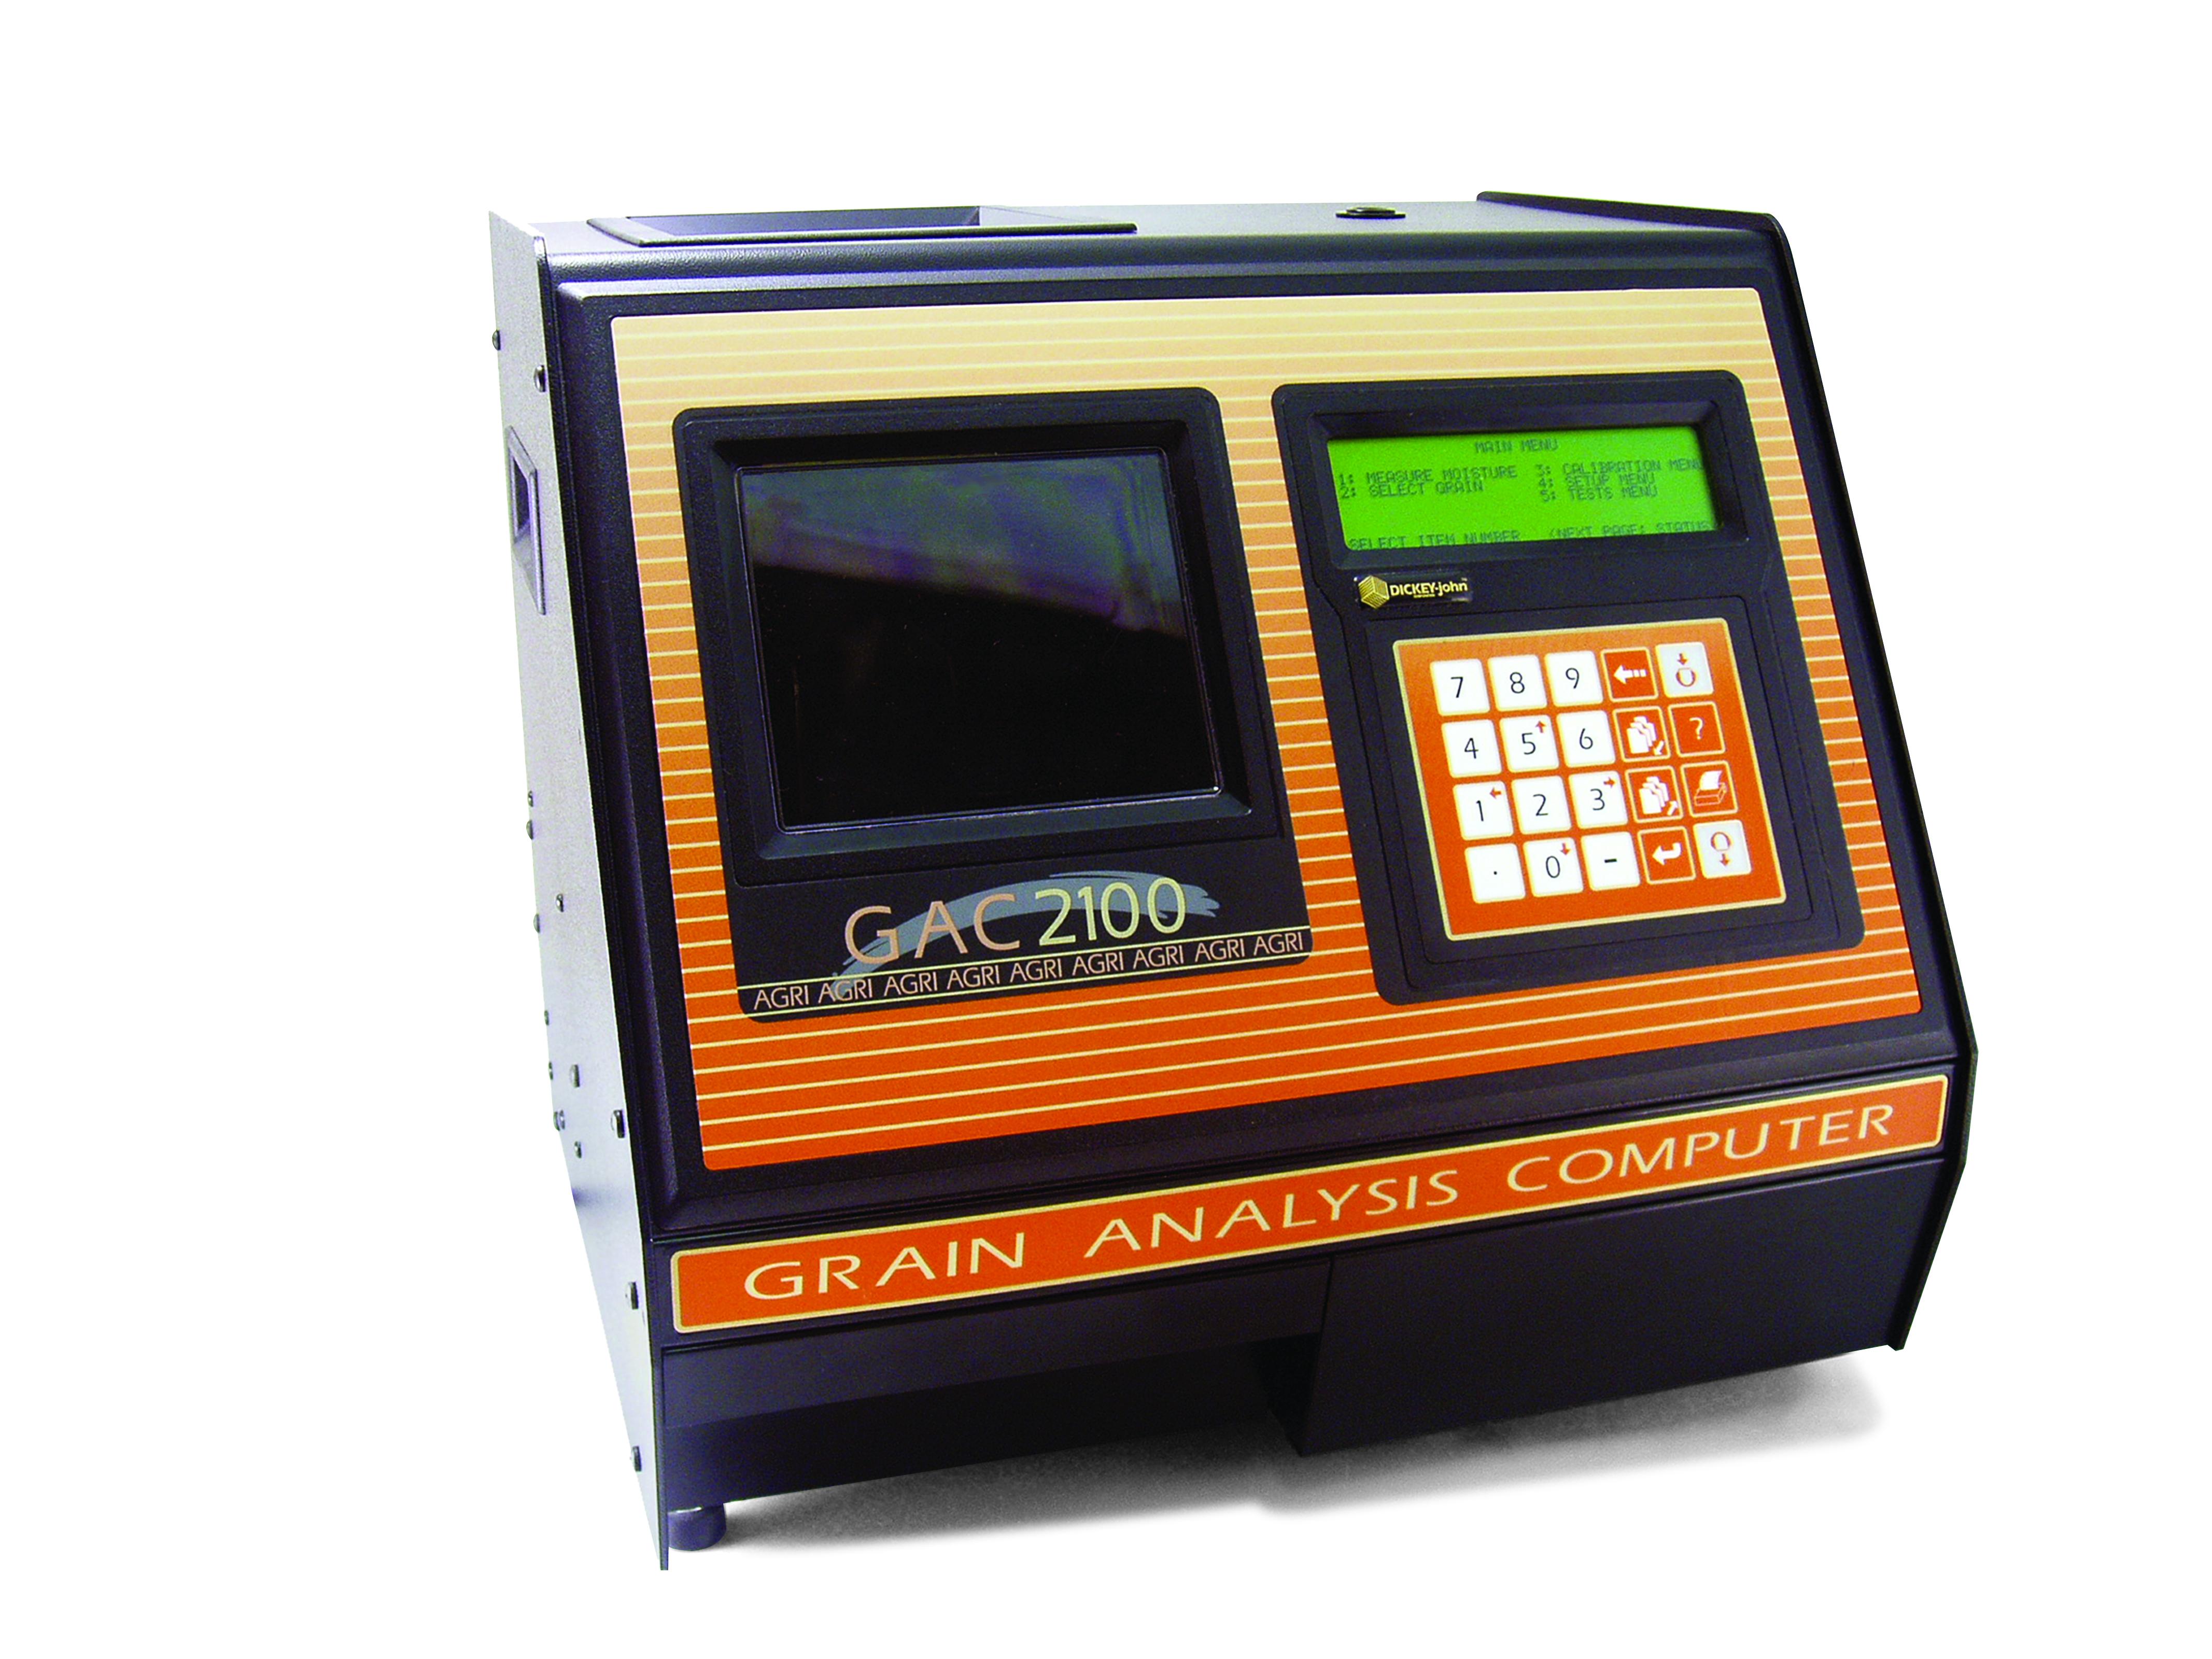 DICKEY-john GAC 2000/2100 Service and Calibration